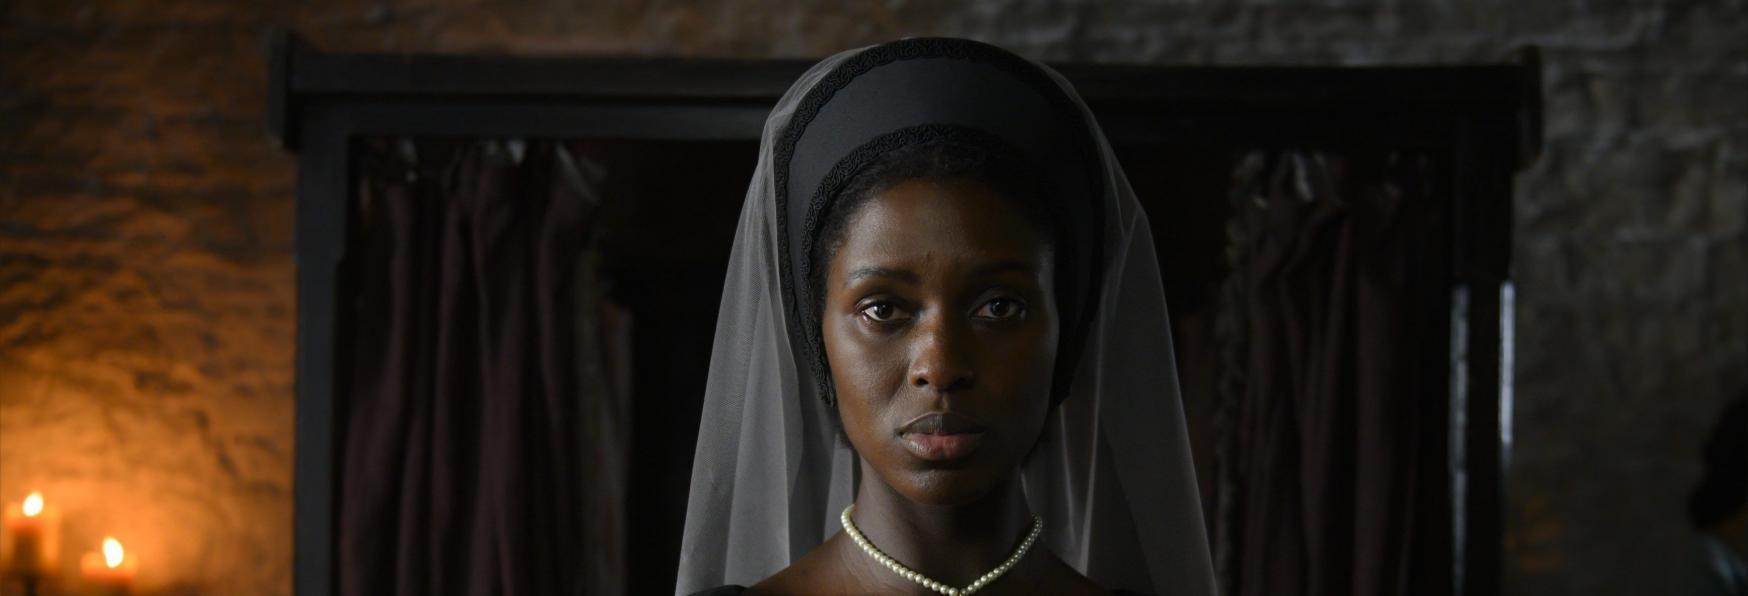 Anne Boleyn: Jodie Turner-Smith protagonista del primo Teaser Trailer della Serie TV